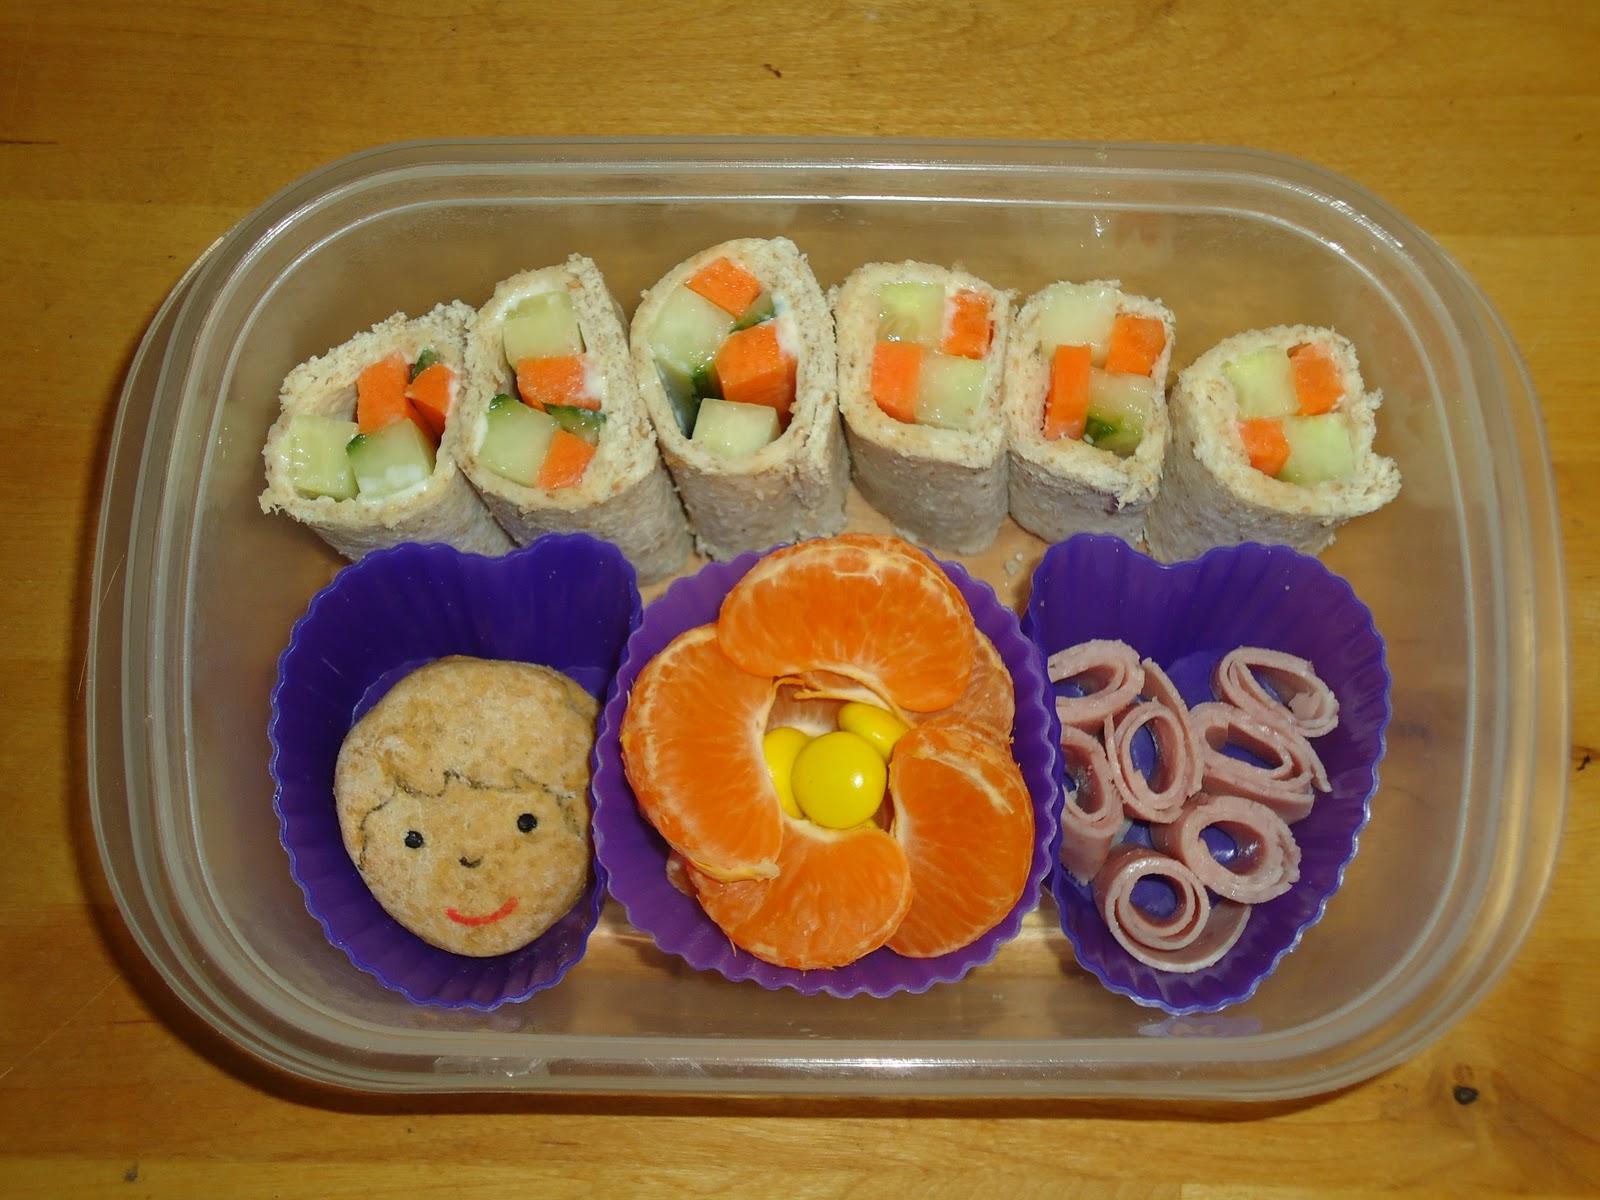 Some Sandwich Sushi, Ham roll ups, Nectraine Flower and Dan Jon Jr Biscuits